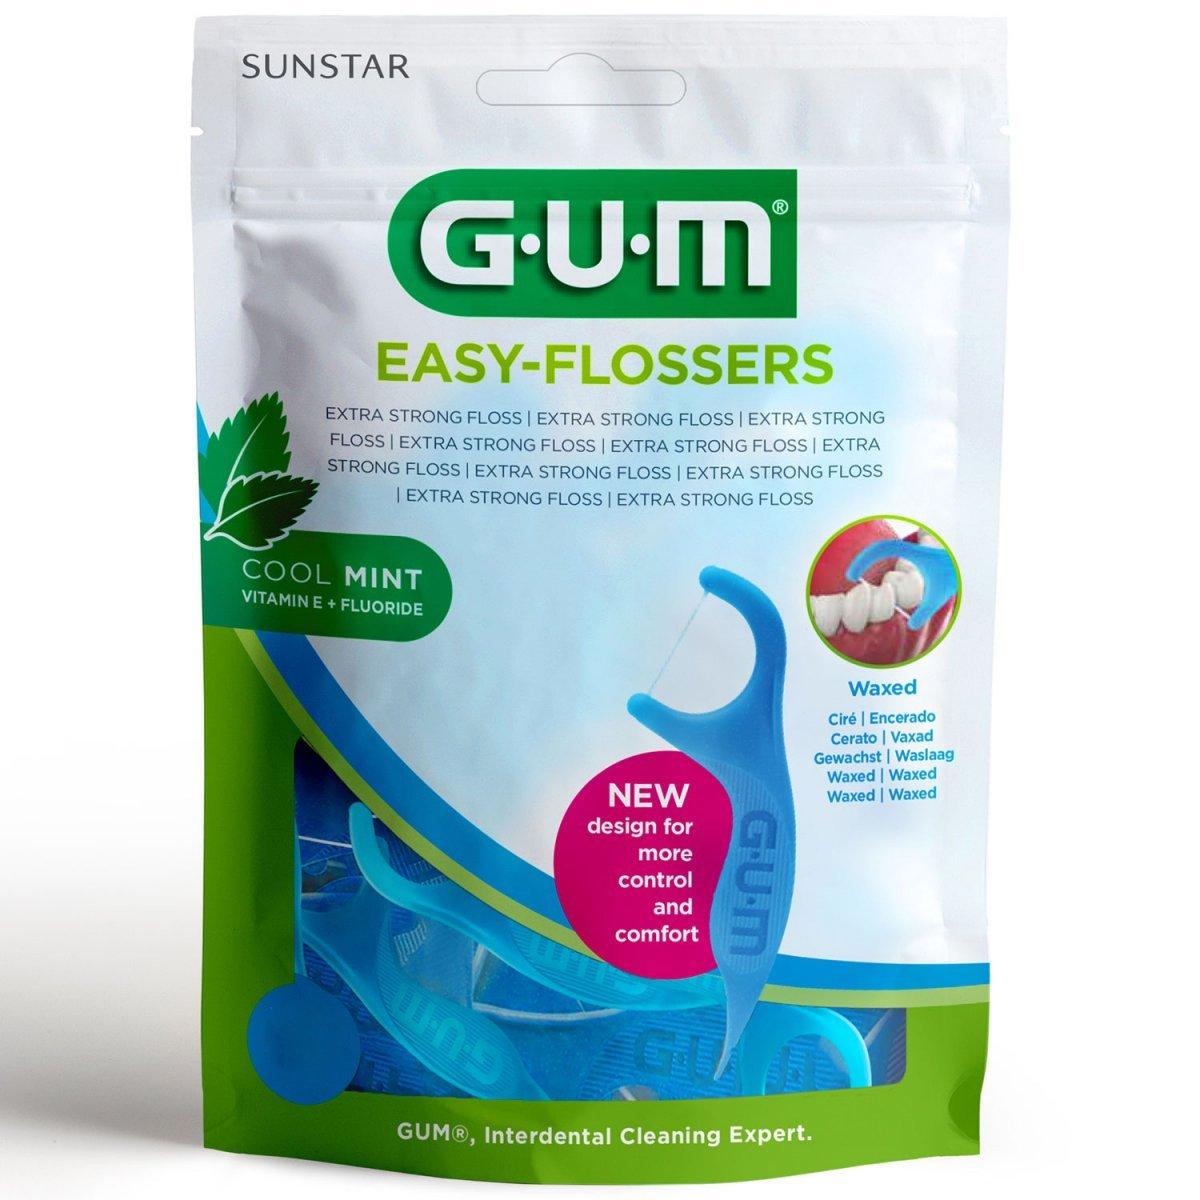 Gum Easy Flossers + Fluoride & Vitamin E Κερωμένο Οδοντικό Νήμα με Γεύση Δροσερής Μέντας (890) – 50 Τεμάχια